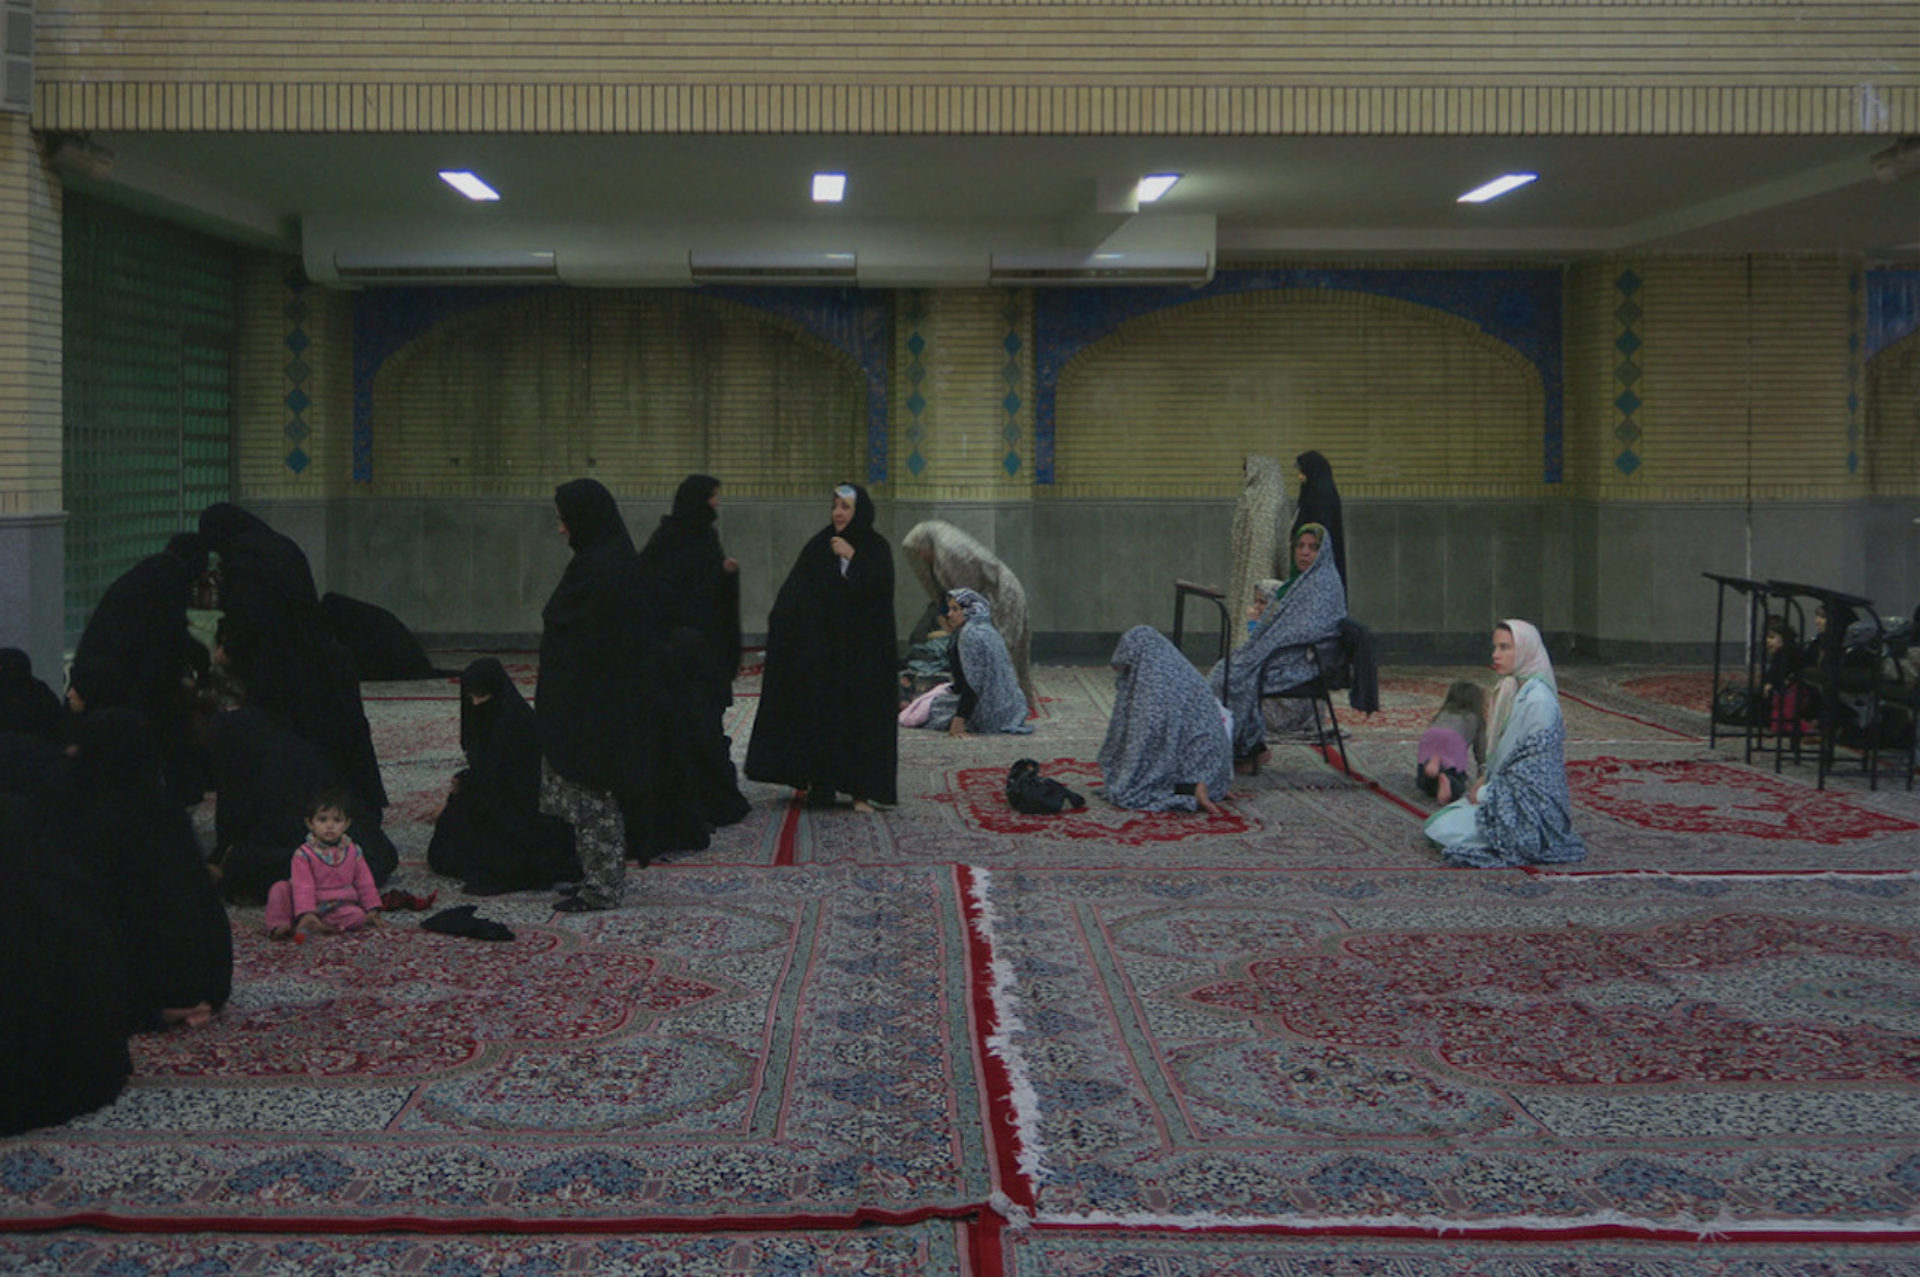 Aneta Grzeszykowska, Iranian Filmstills, 2015, #14